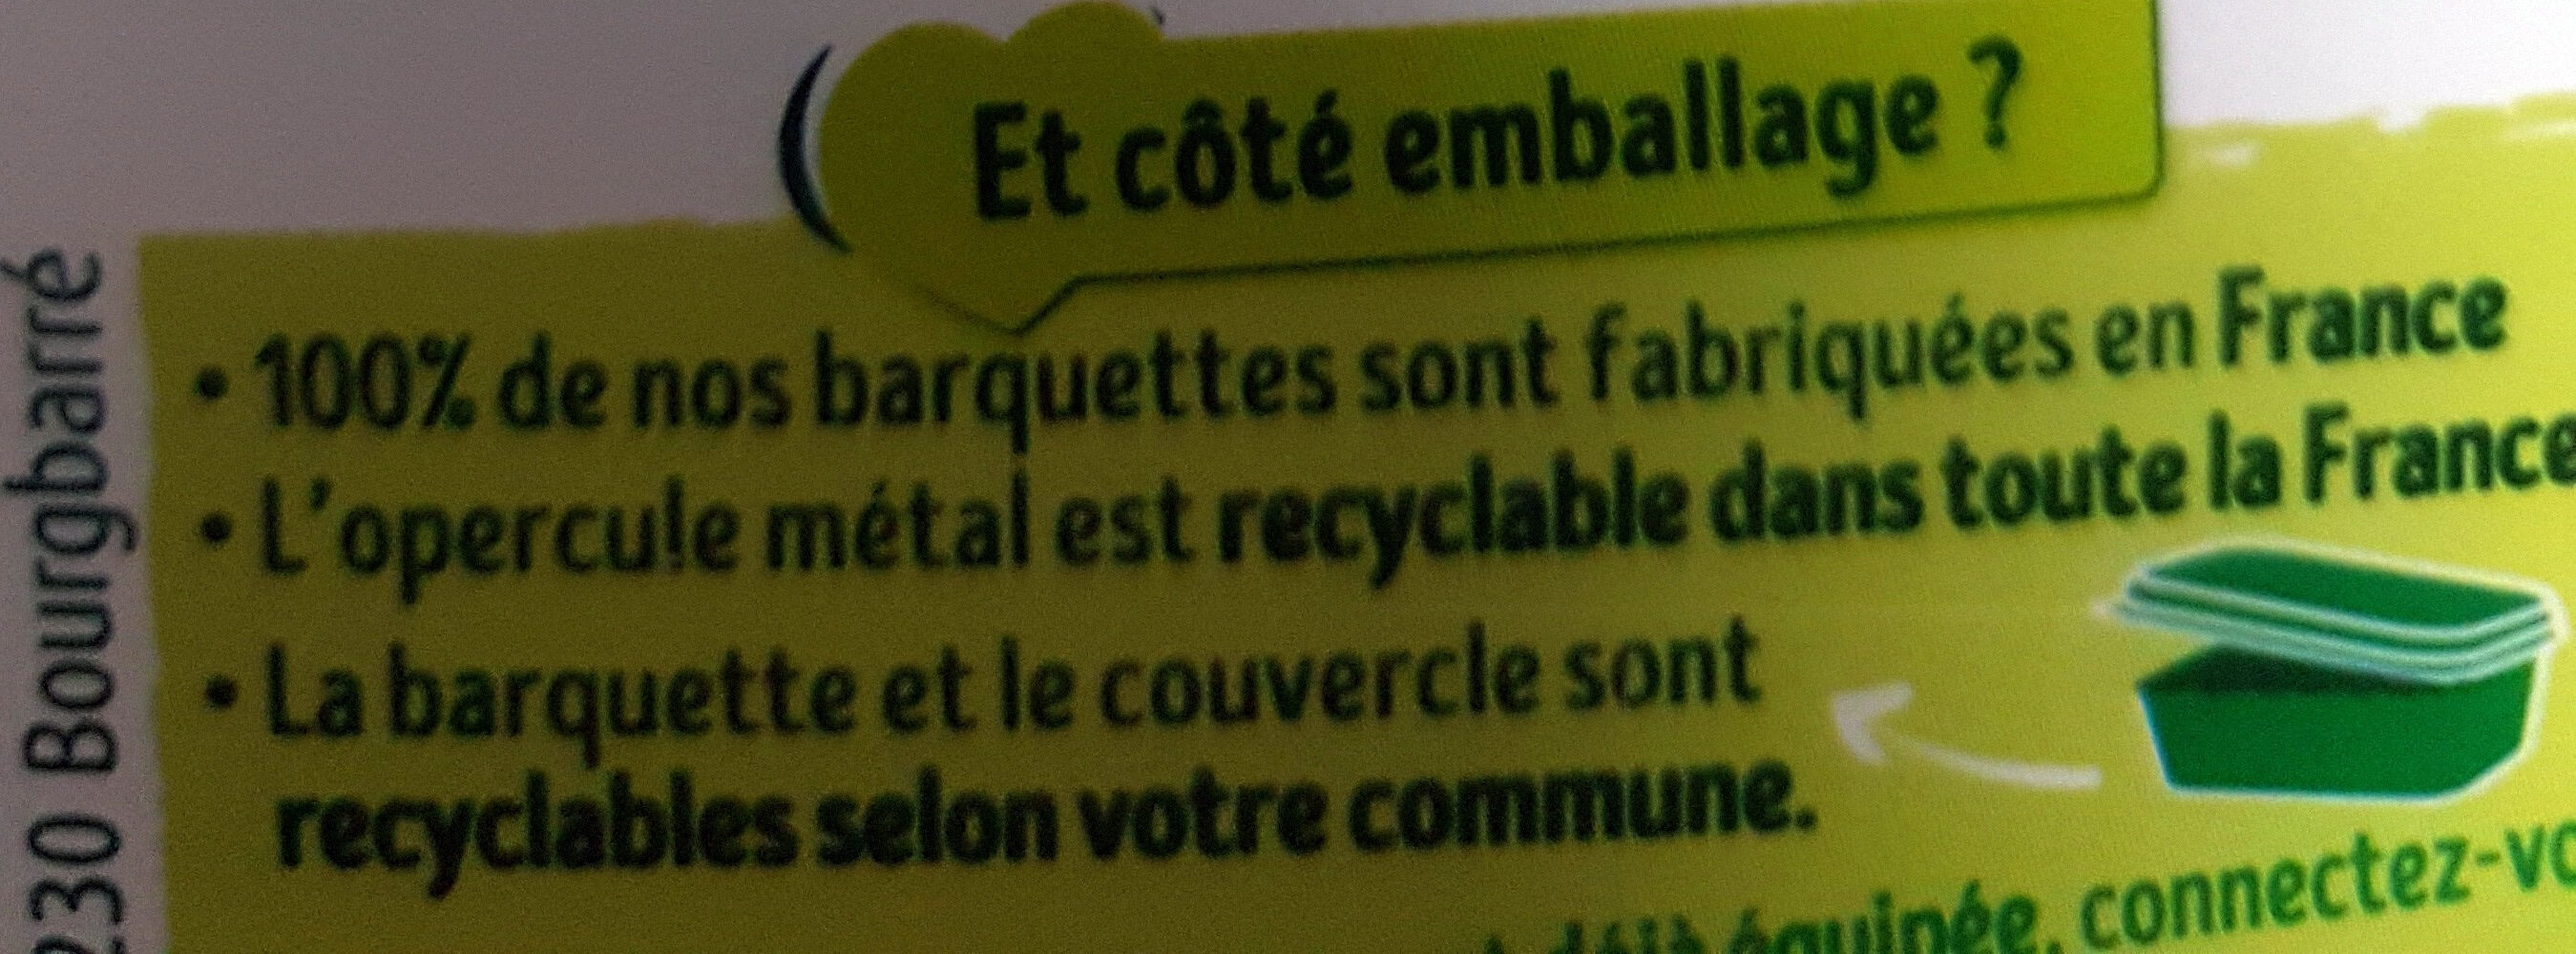 Primevère Tartine doux végétal - Recyclinginstructies en / of verpakkingsinformatie - fr